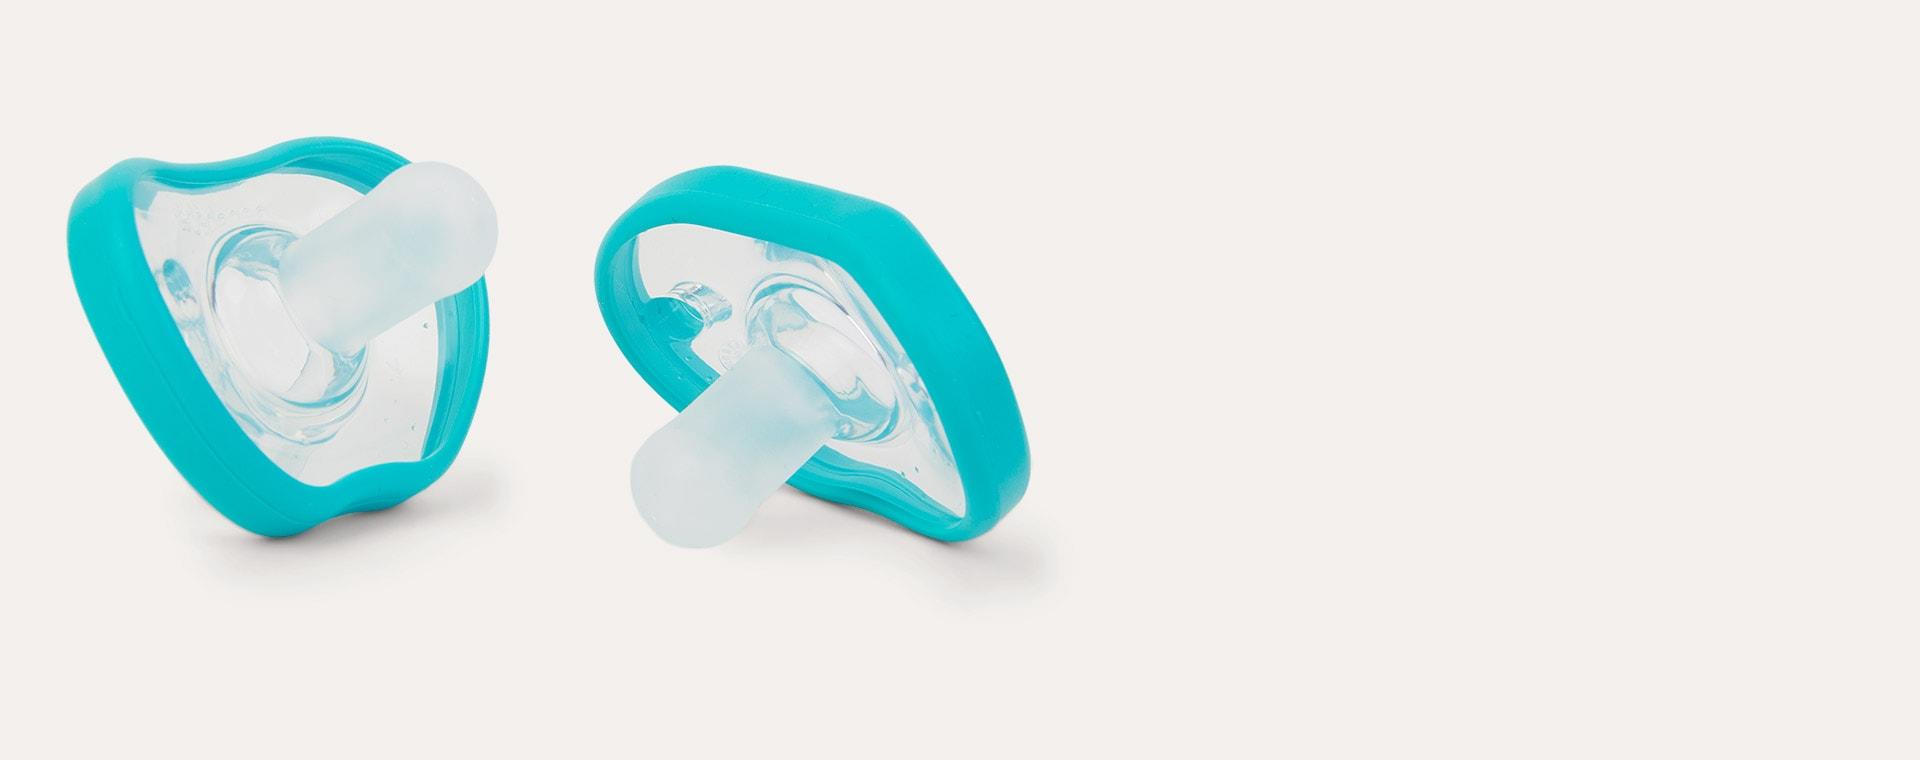 Teal nanobébé Breastmilk Bottle Starter Set